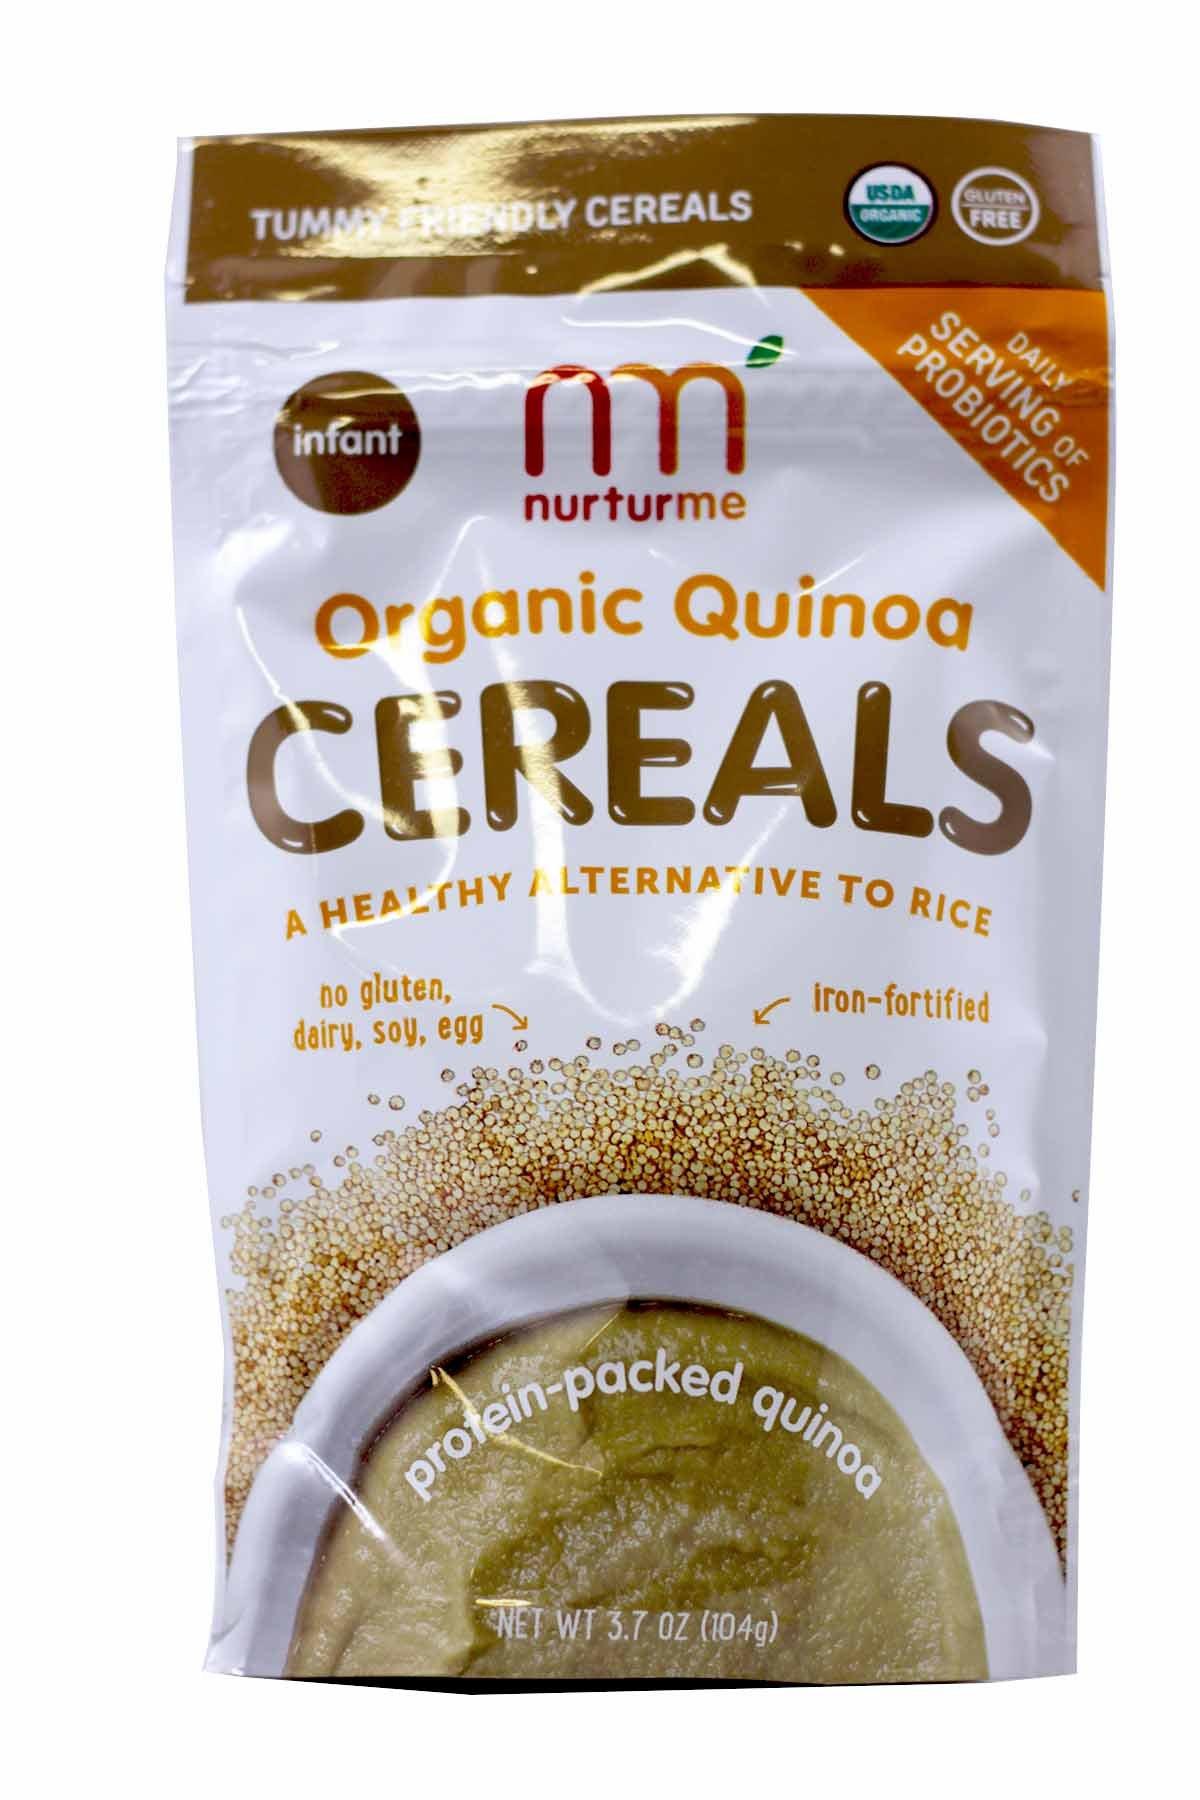 NurturMe Organic Baby Cereal - Quinoa - 3.7 oz - 6 pk